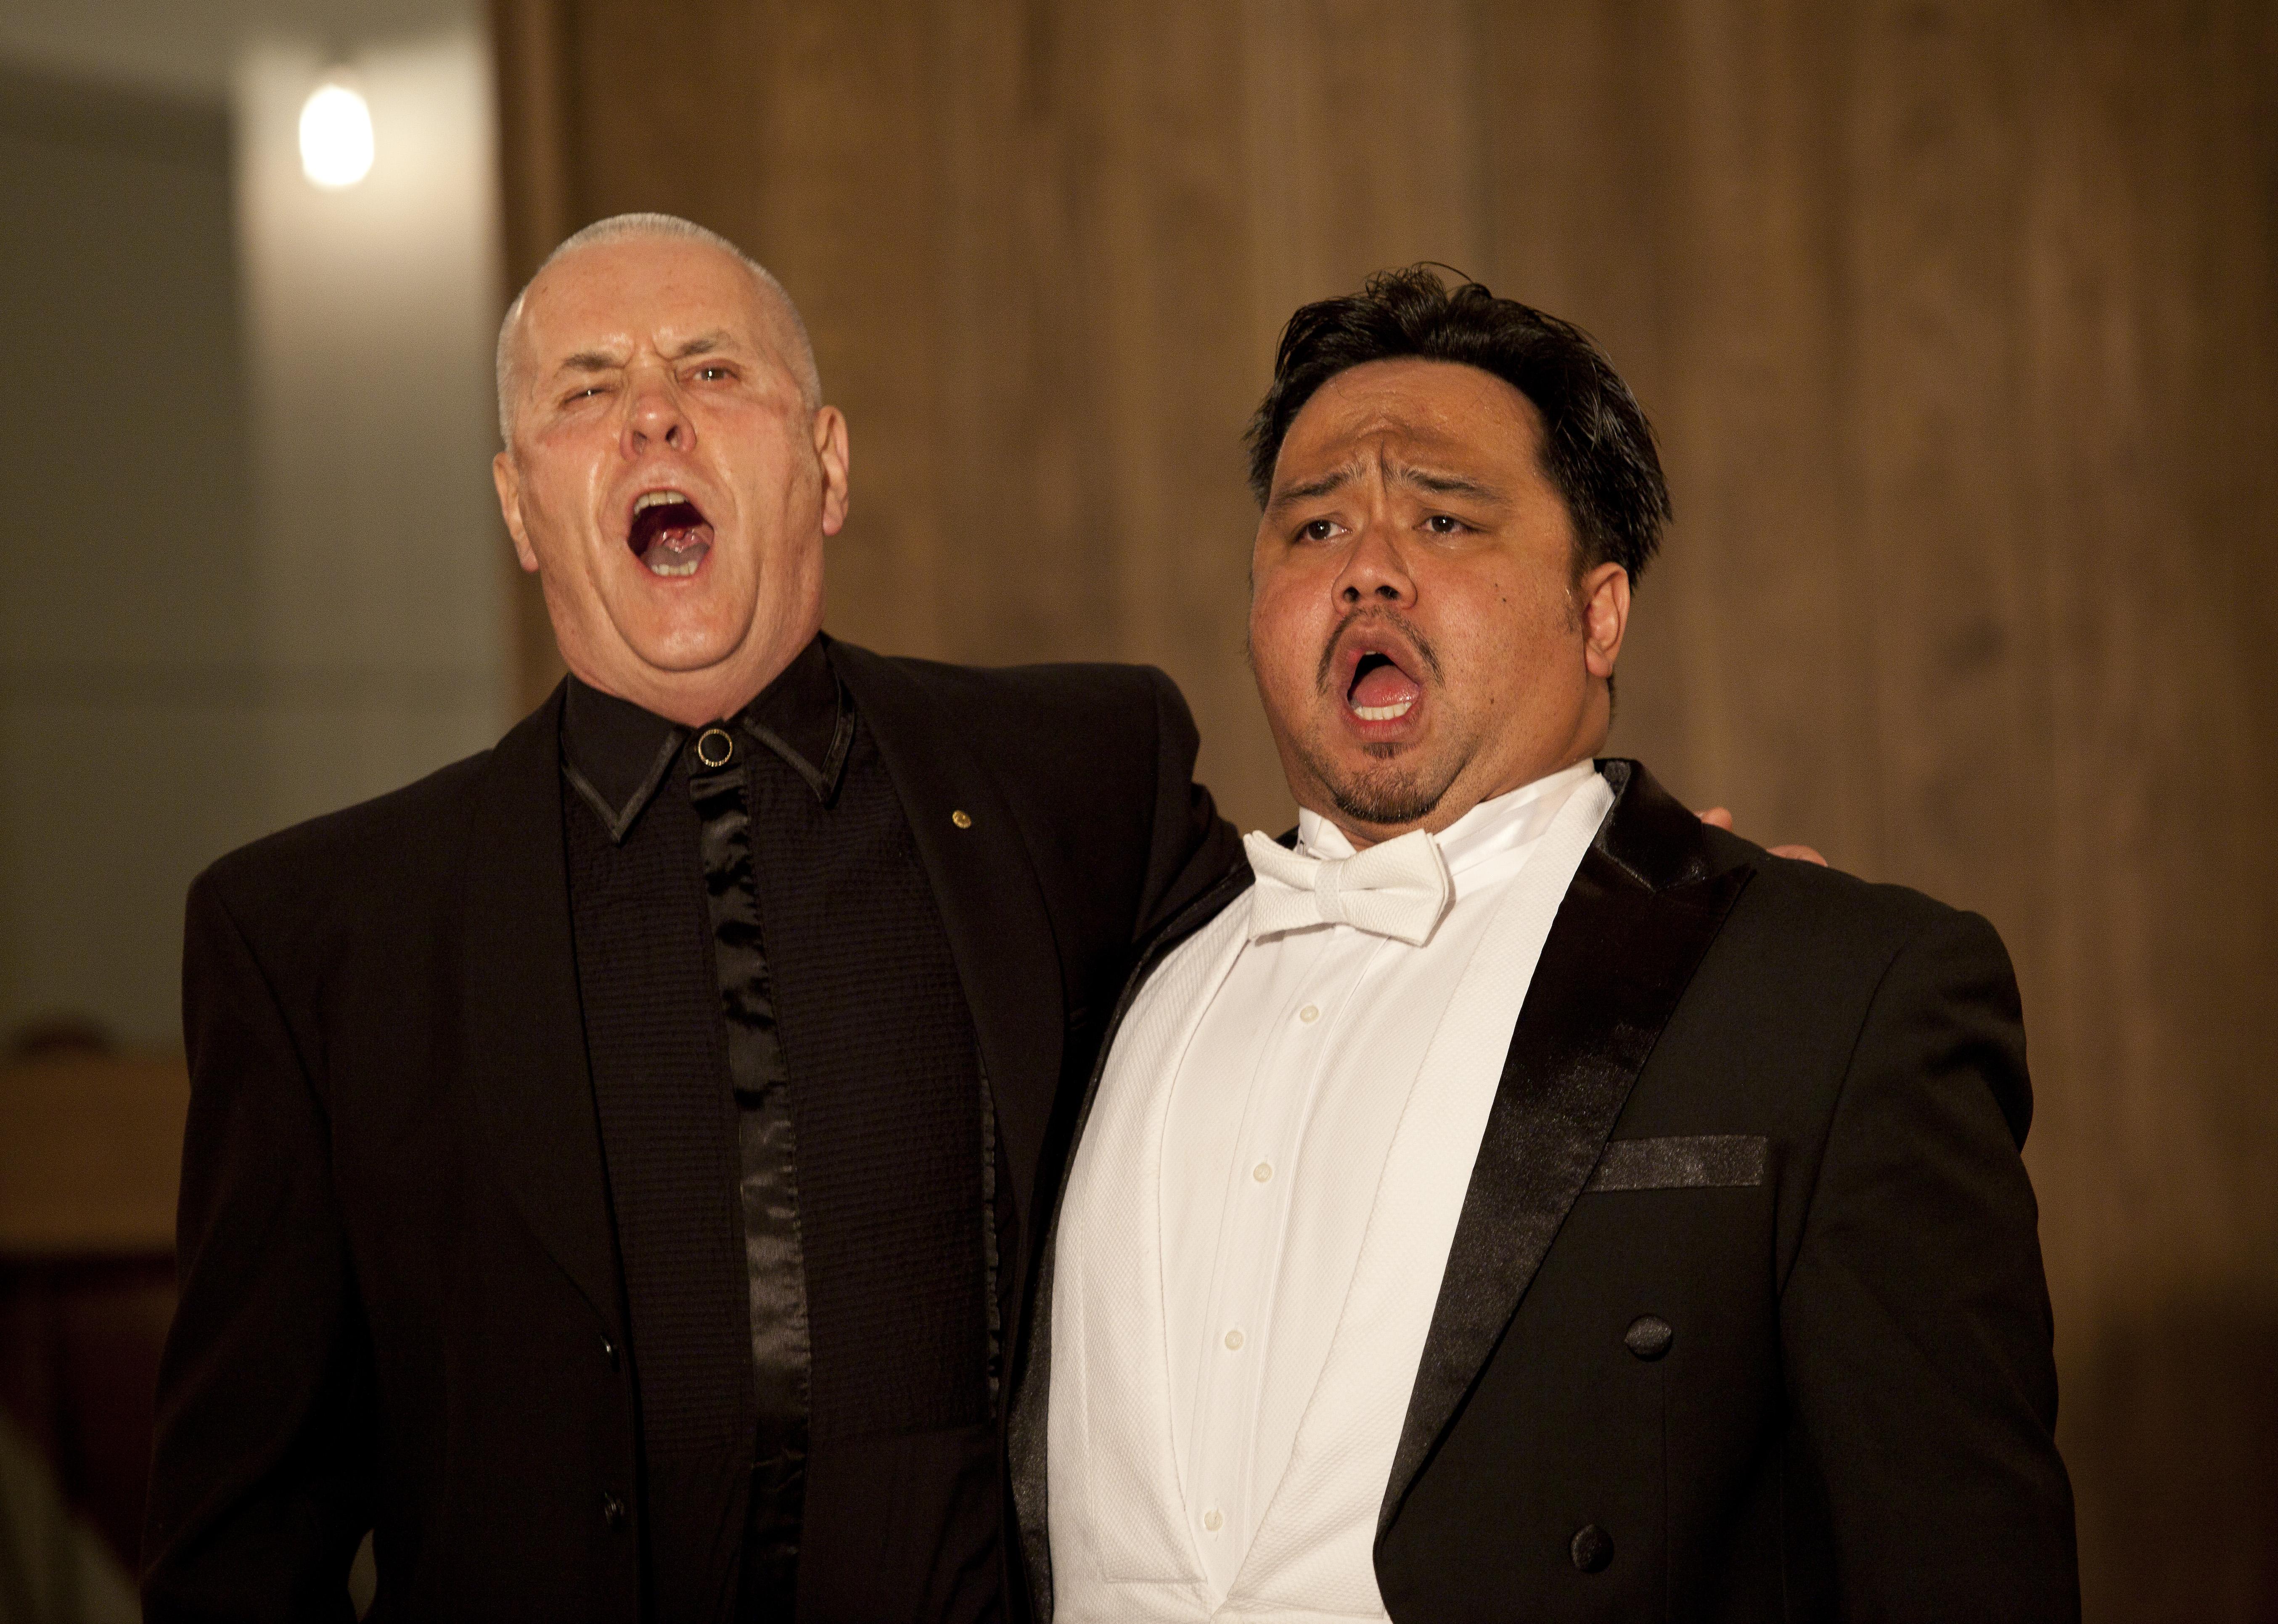 Gertrude Opera_NLOF2015_Pearlfishers_MG_9535